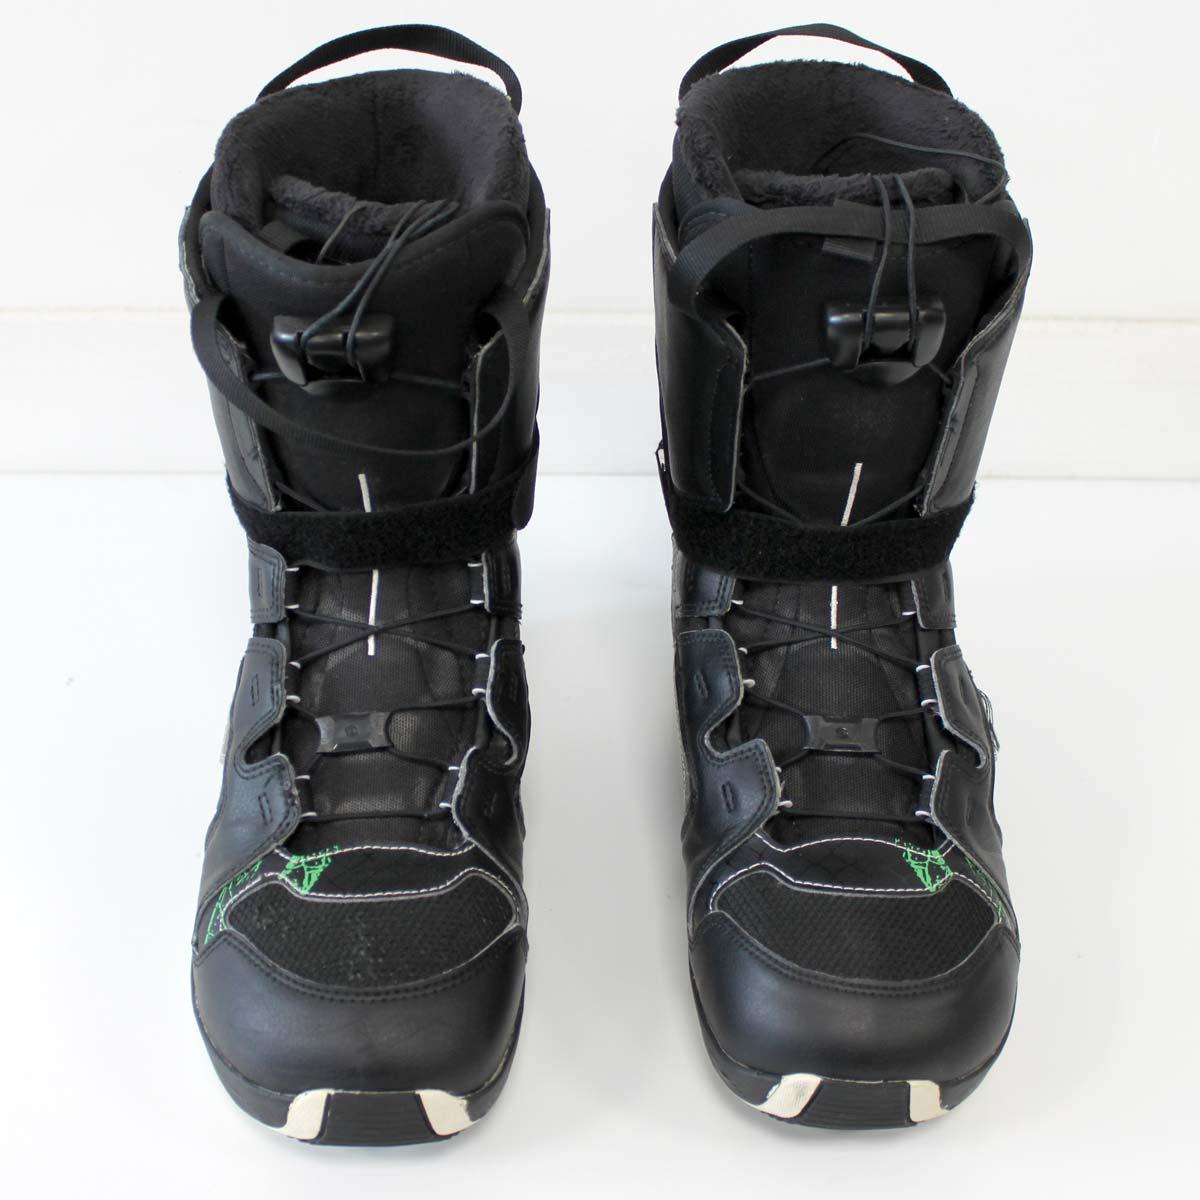 40c43185 Salomon Faction Snowboard Boots - UK 10 - Very Good Condition - 8/10